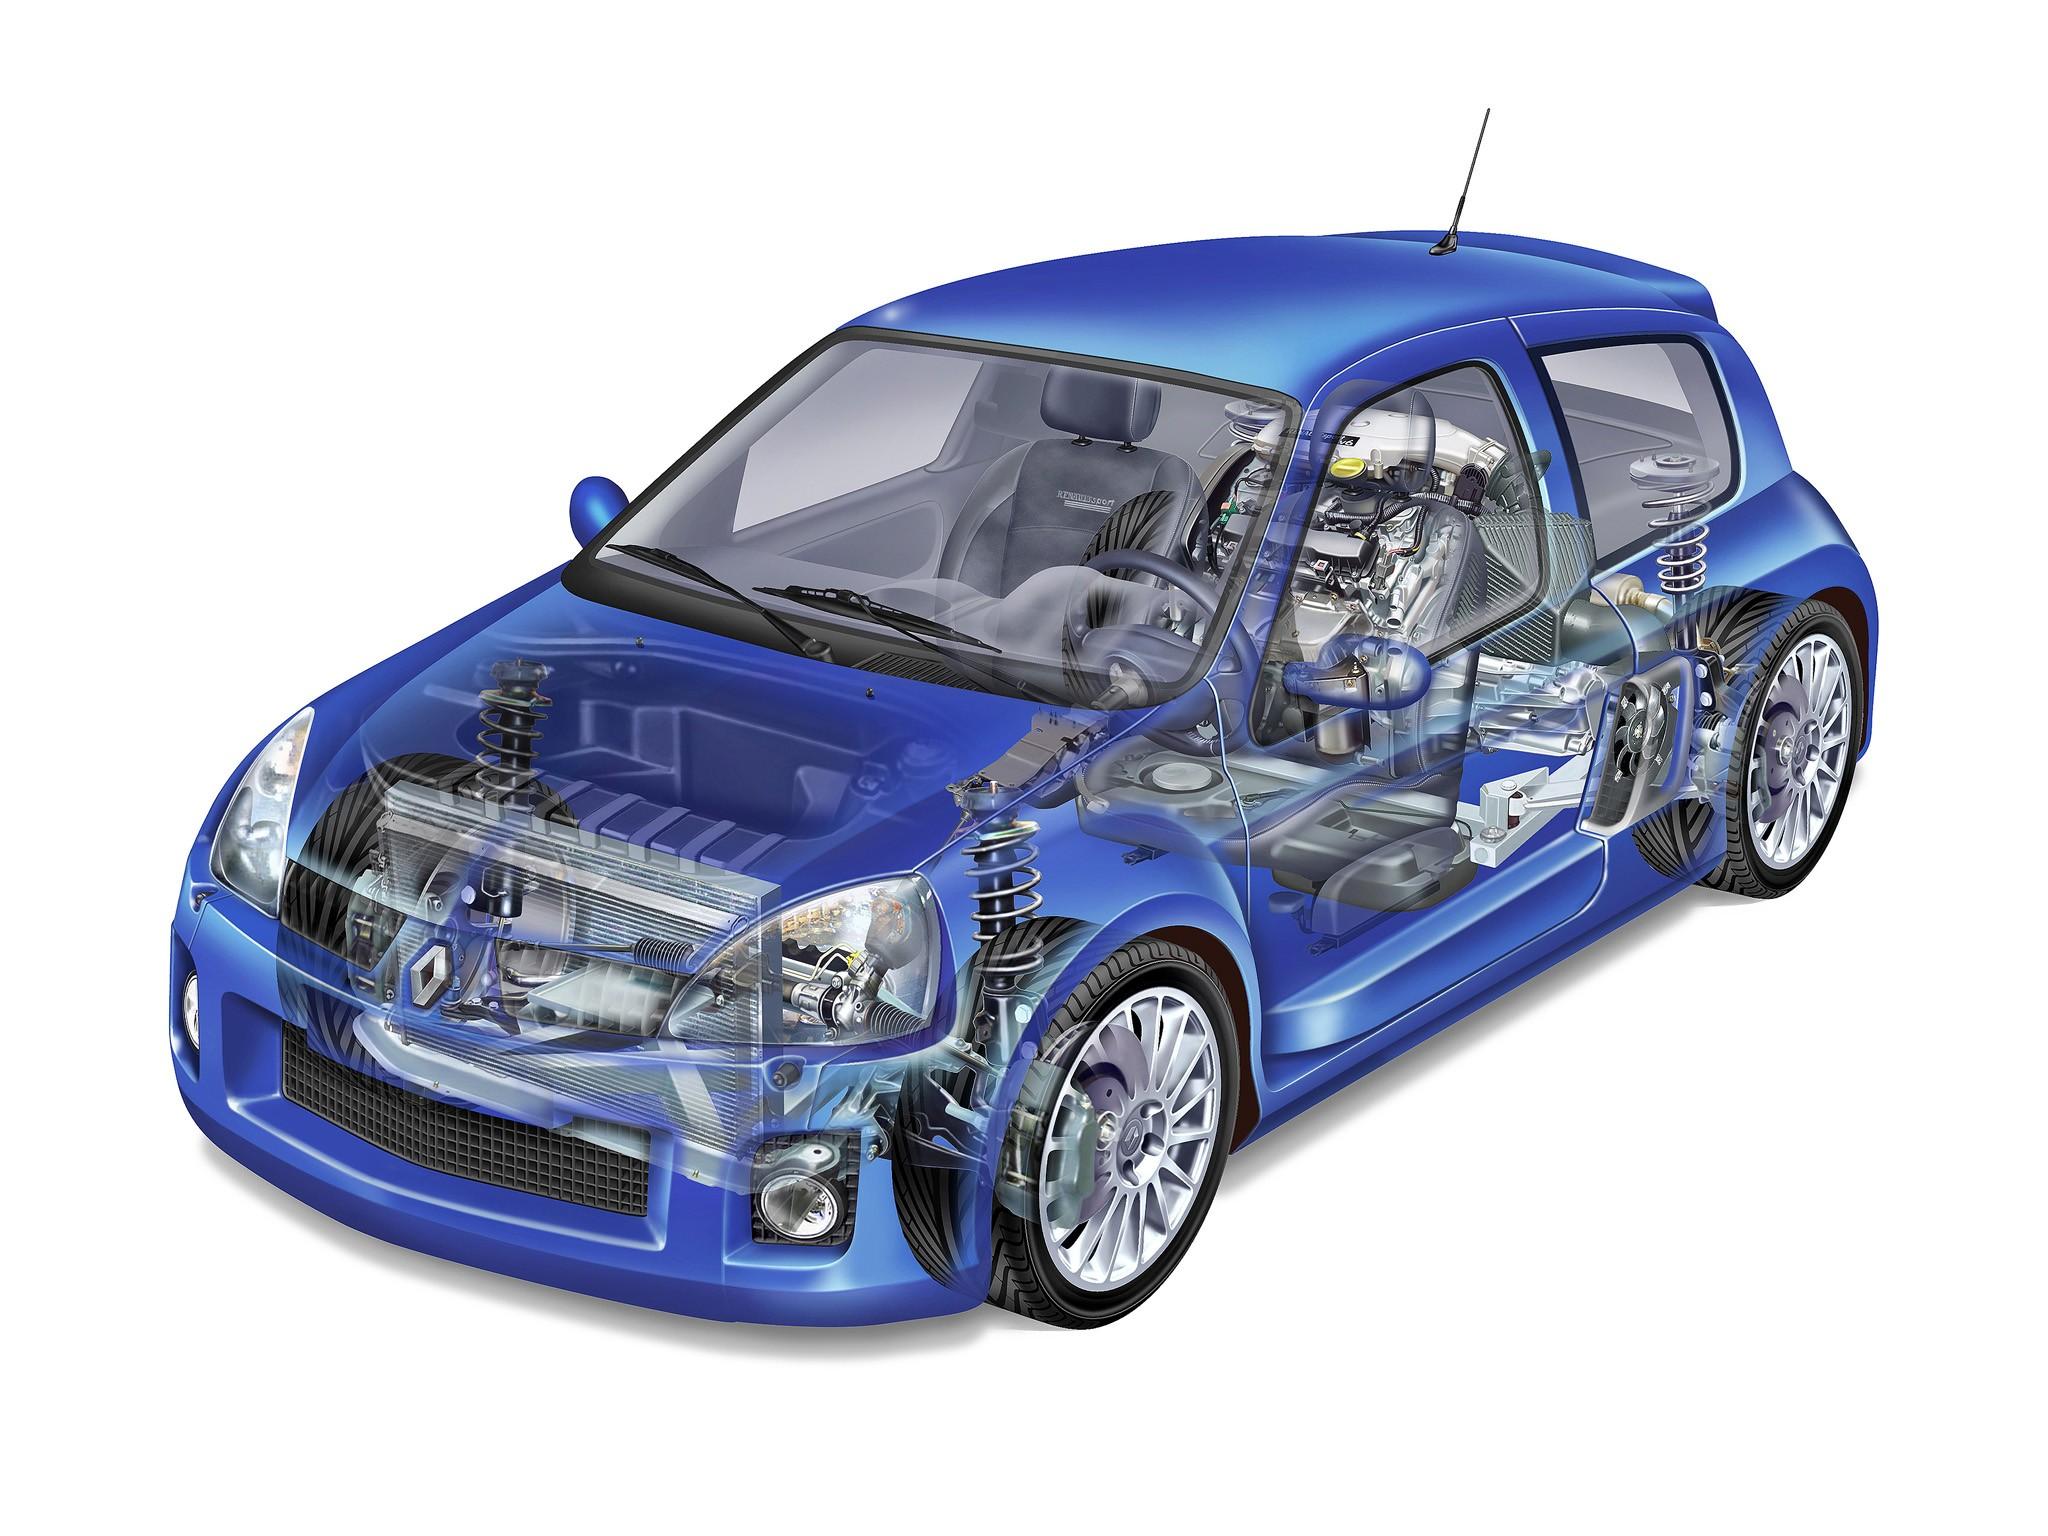 Car Skeleton Diagram 2003 2005 Renault Clio V6 Illustration Unattributed Of Car Skeleton Diagram